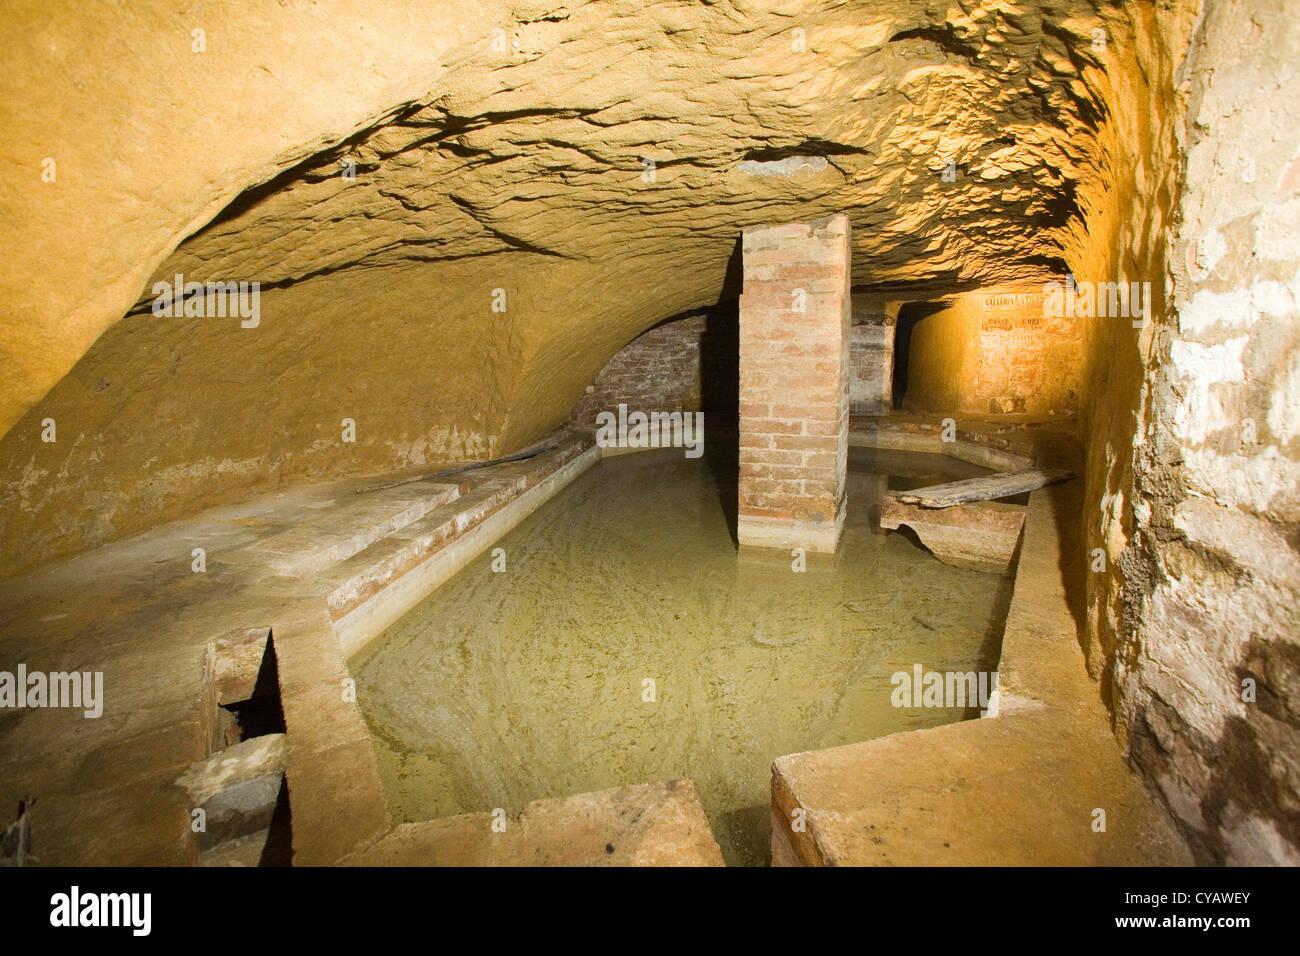 europe, italy, tuscany, siena, the bottini, ancient aqueduct Stock Photo